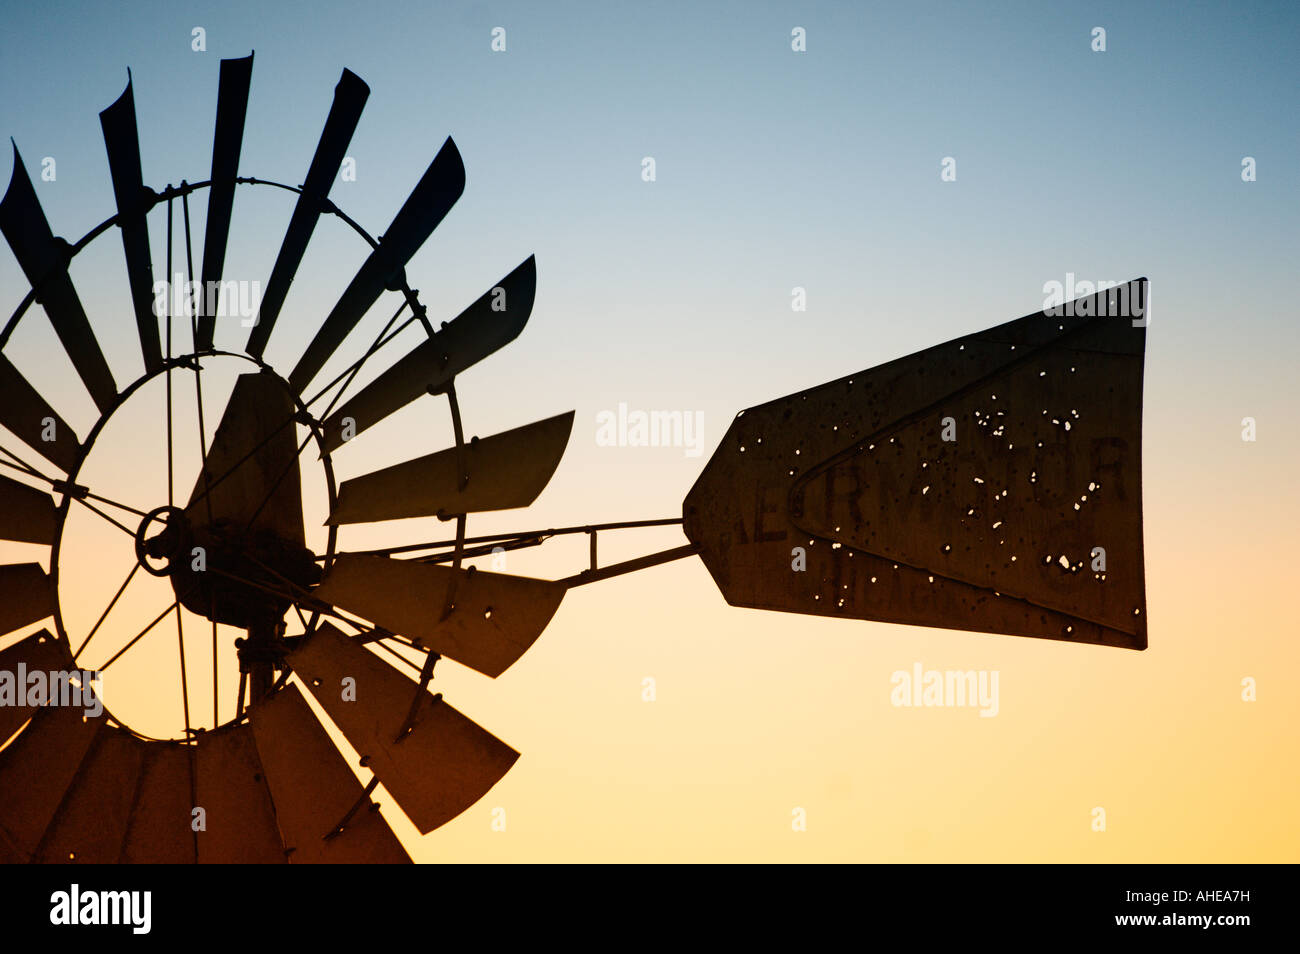 Windmill vanes close up at sunset - Stock Image